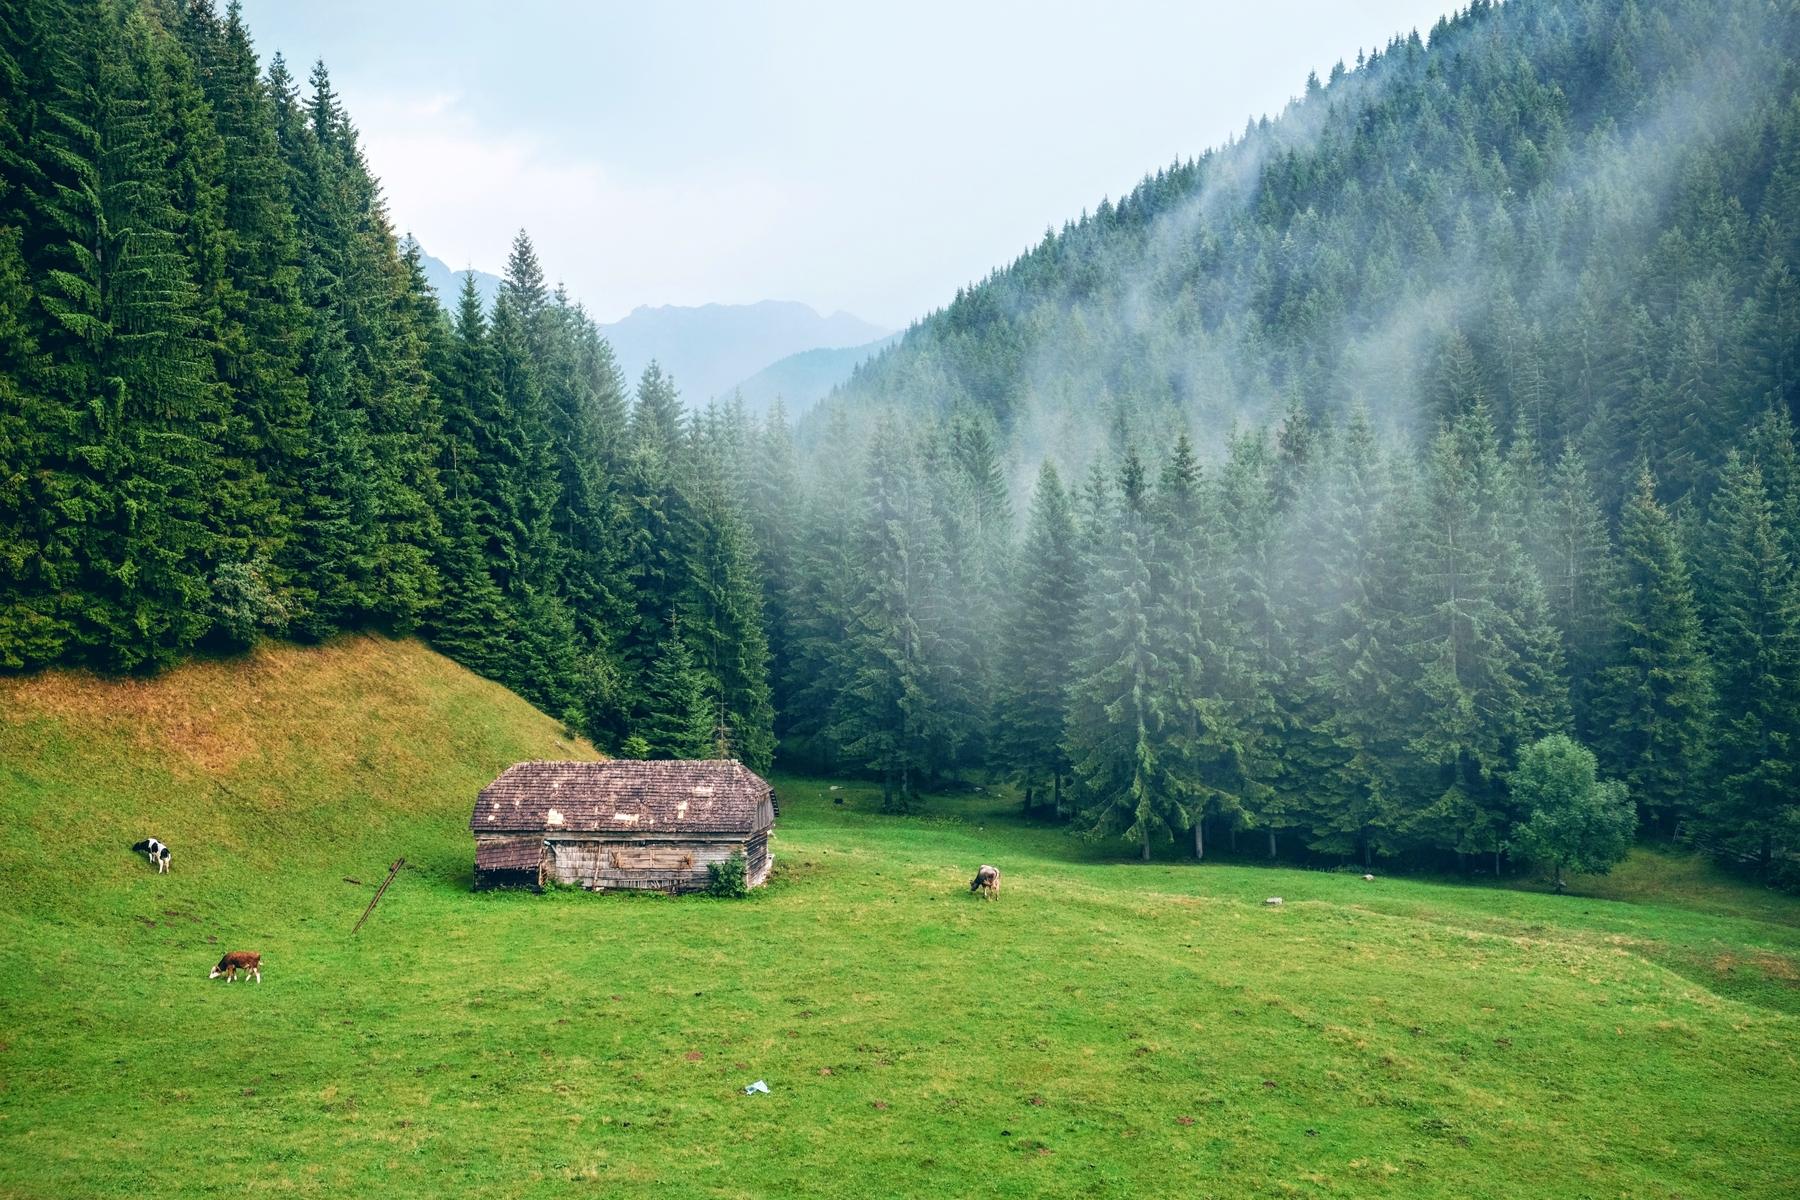 Cudowna rumuńska przyroda